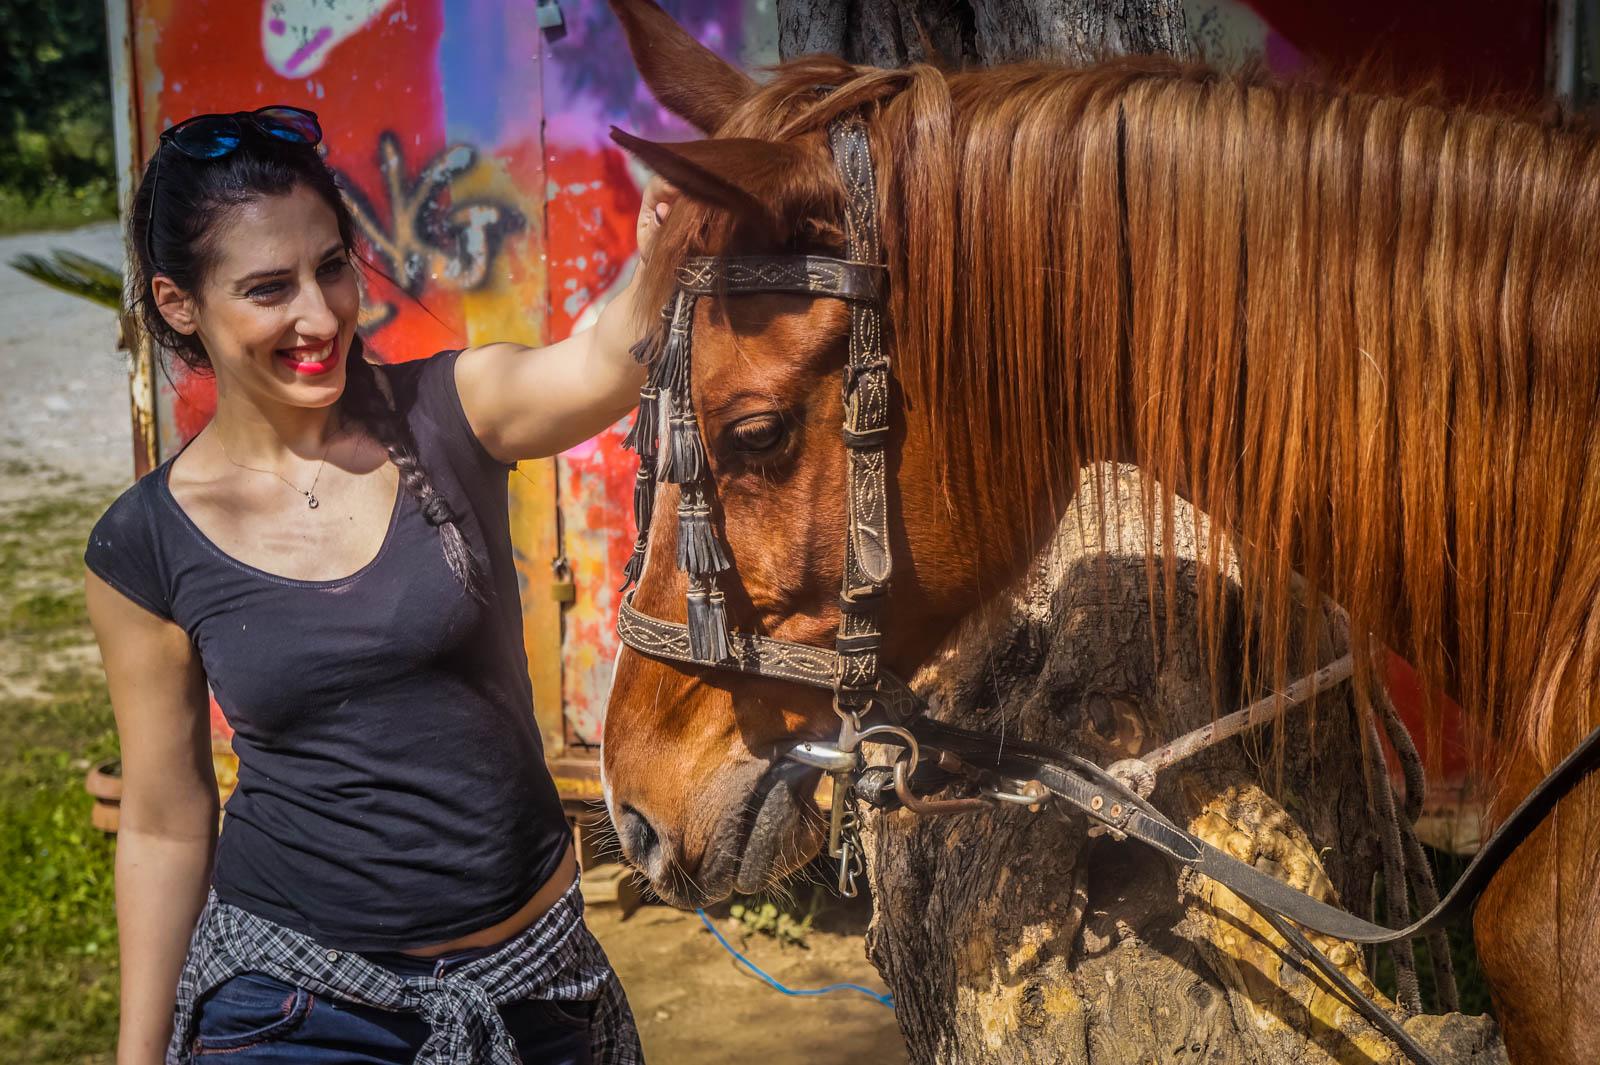 horseback-riding-pelion-greece-la-vie-en-blog-all-rights-reserved-8